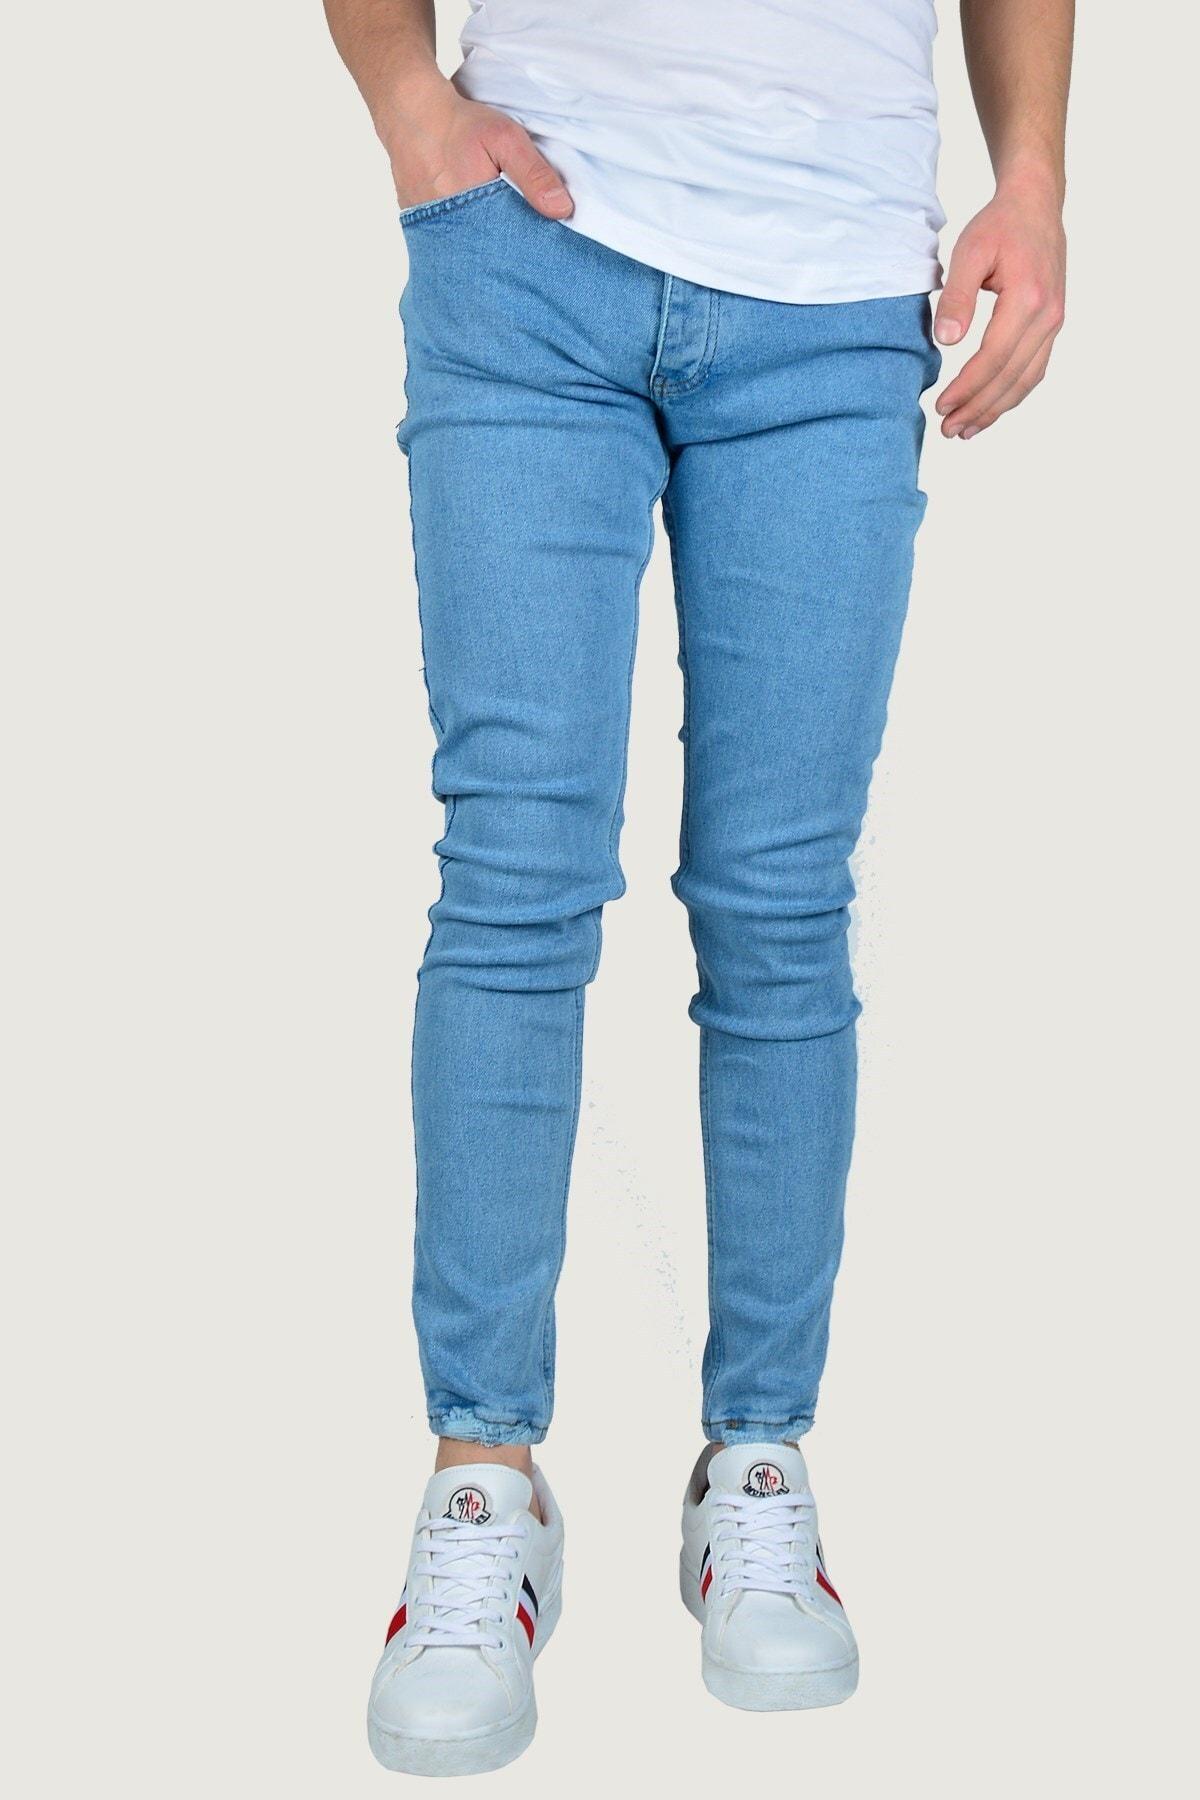 Terapi Men Erkek Kot Pantolon 9K-2100320-011 Buz Mavisi 2